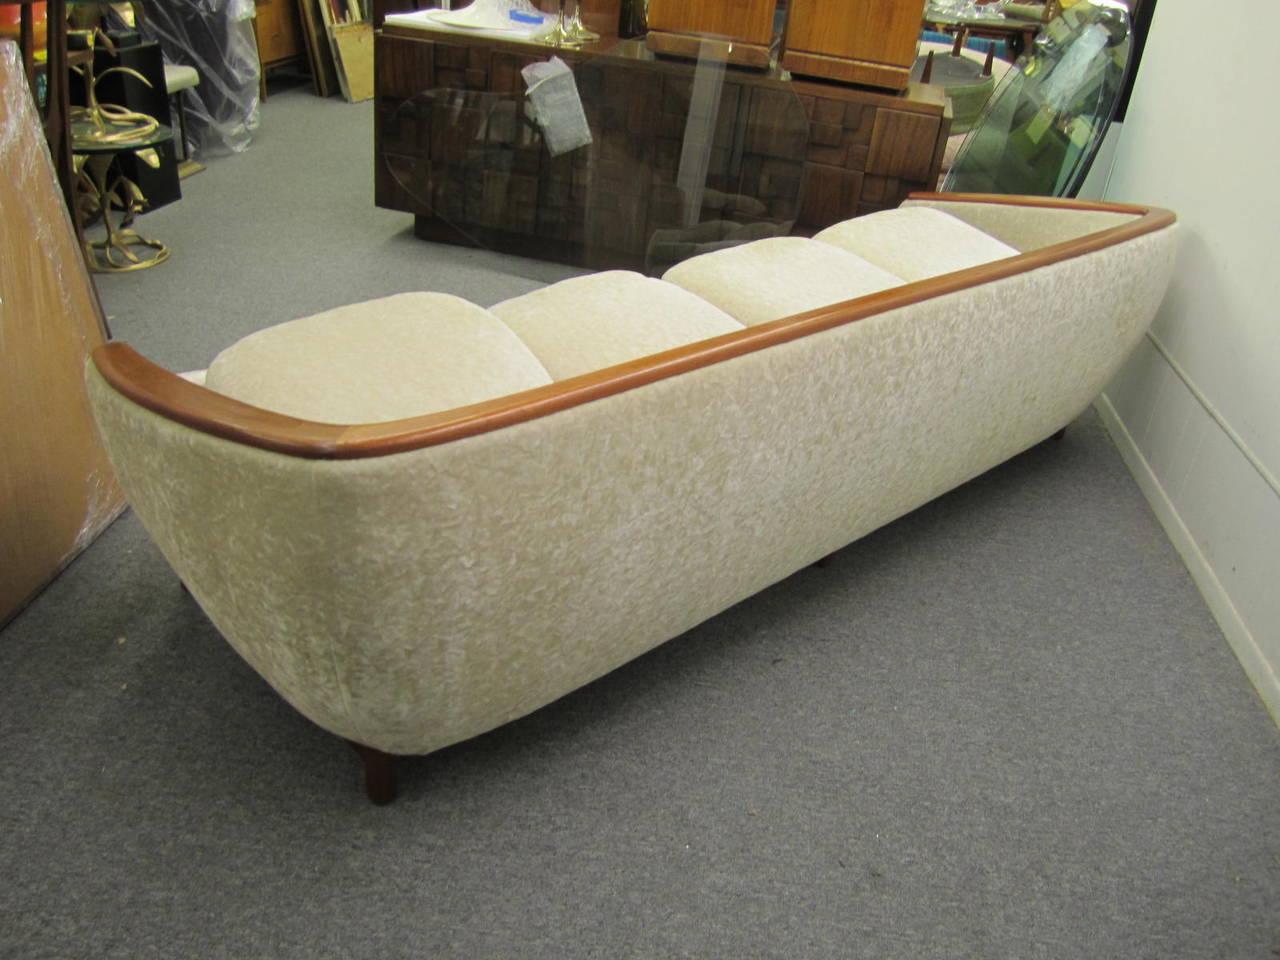 Dazzling R. Huber Curved Back Teak Sofa, Mid-Century Danish Modern For Sale 3